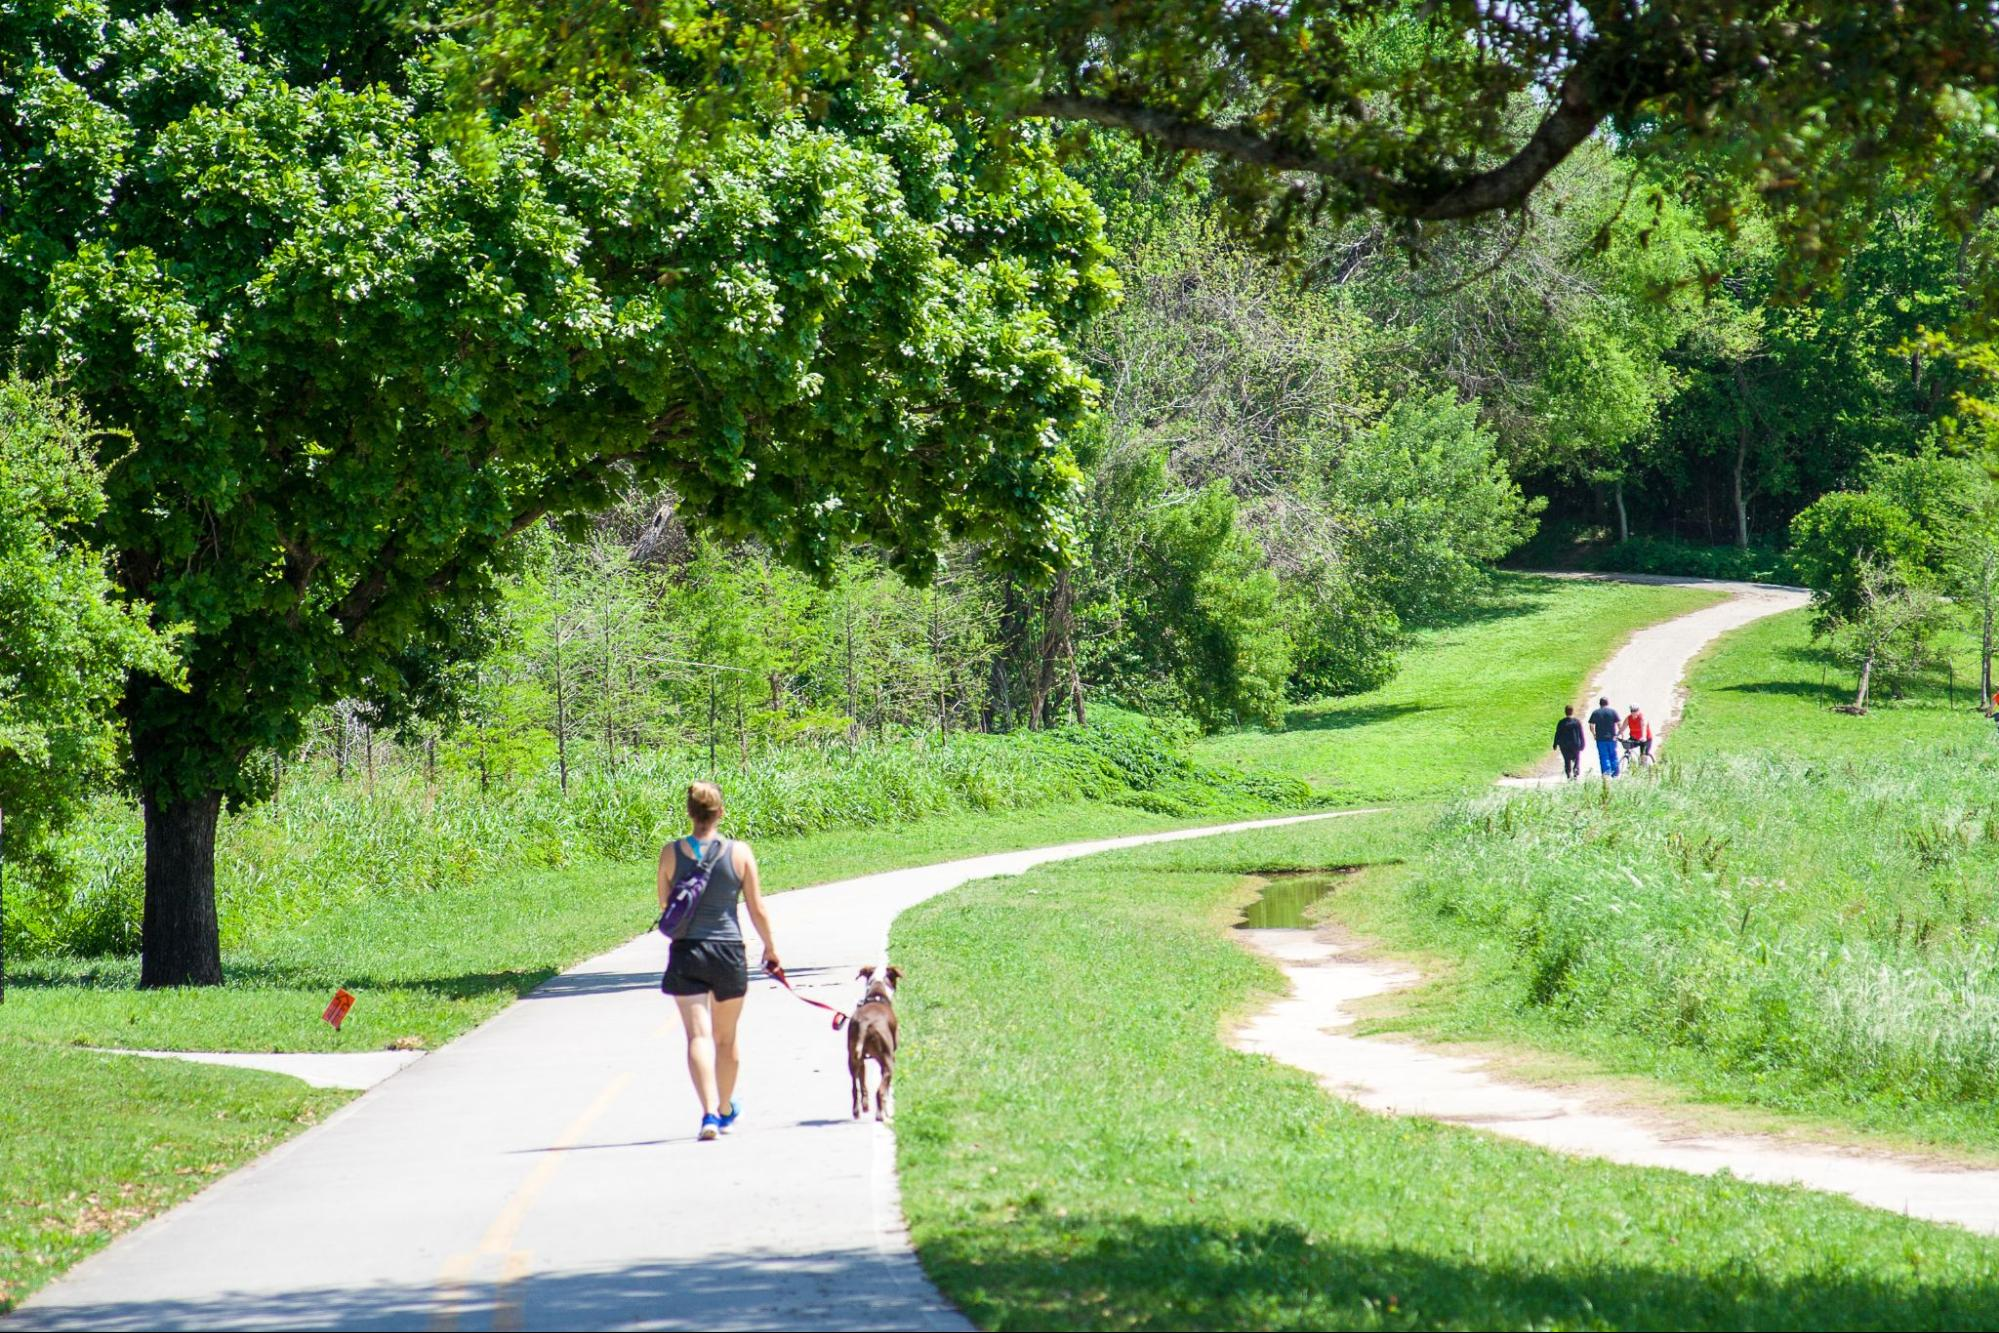 A woman walking her dog on the Buffalo Bayou trails in Houston, Texas